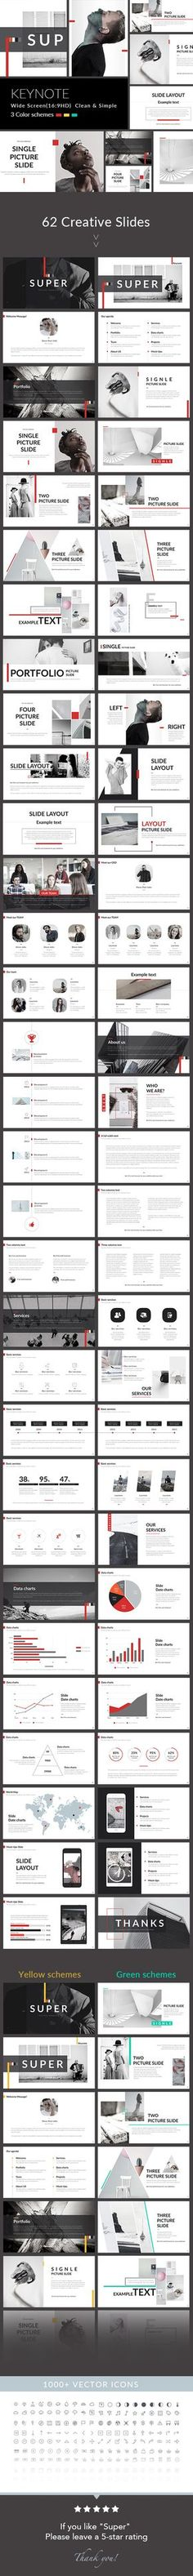 Super - Clean & Simple Keynote Template. Download here: https://graphicriver.net/item/super-clean-simple-keynote-template/16959906?ref=ksioks